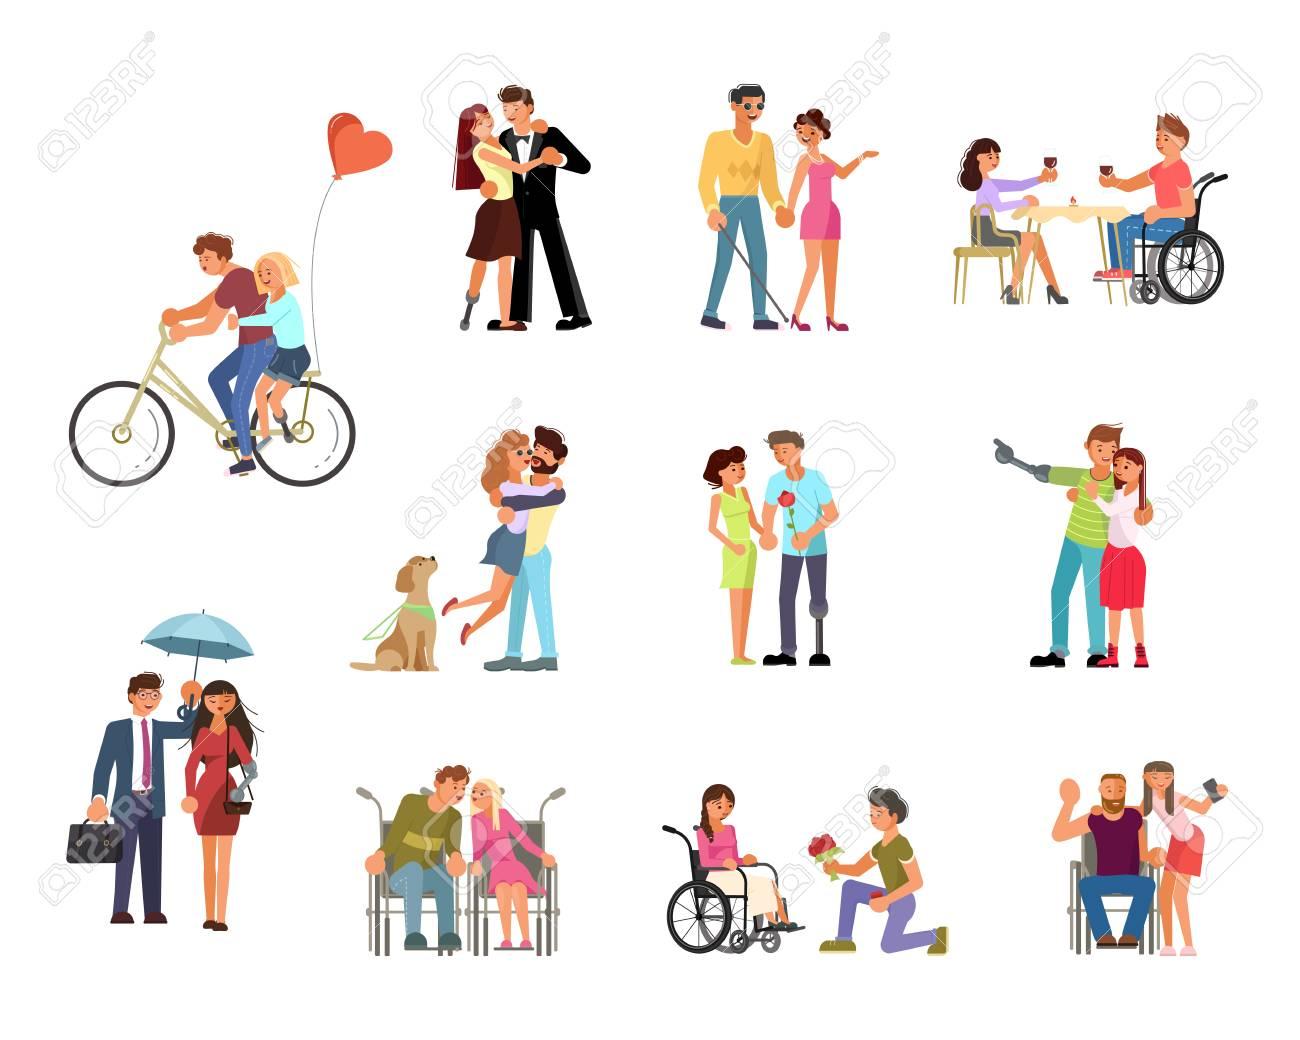 Types of love relationships between people